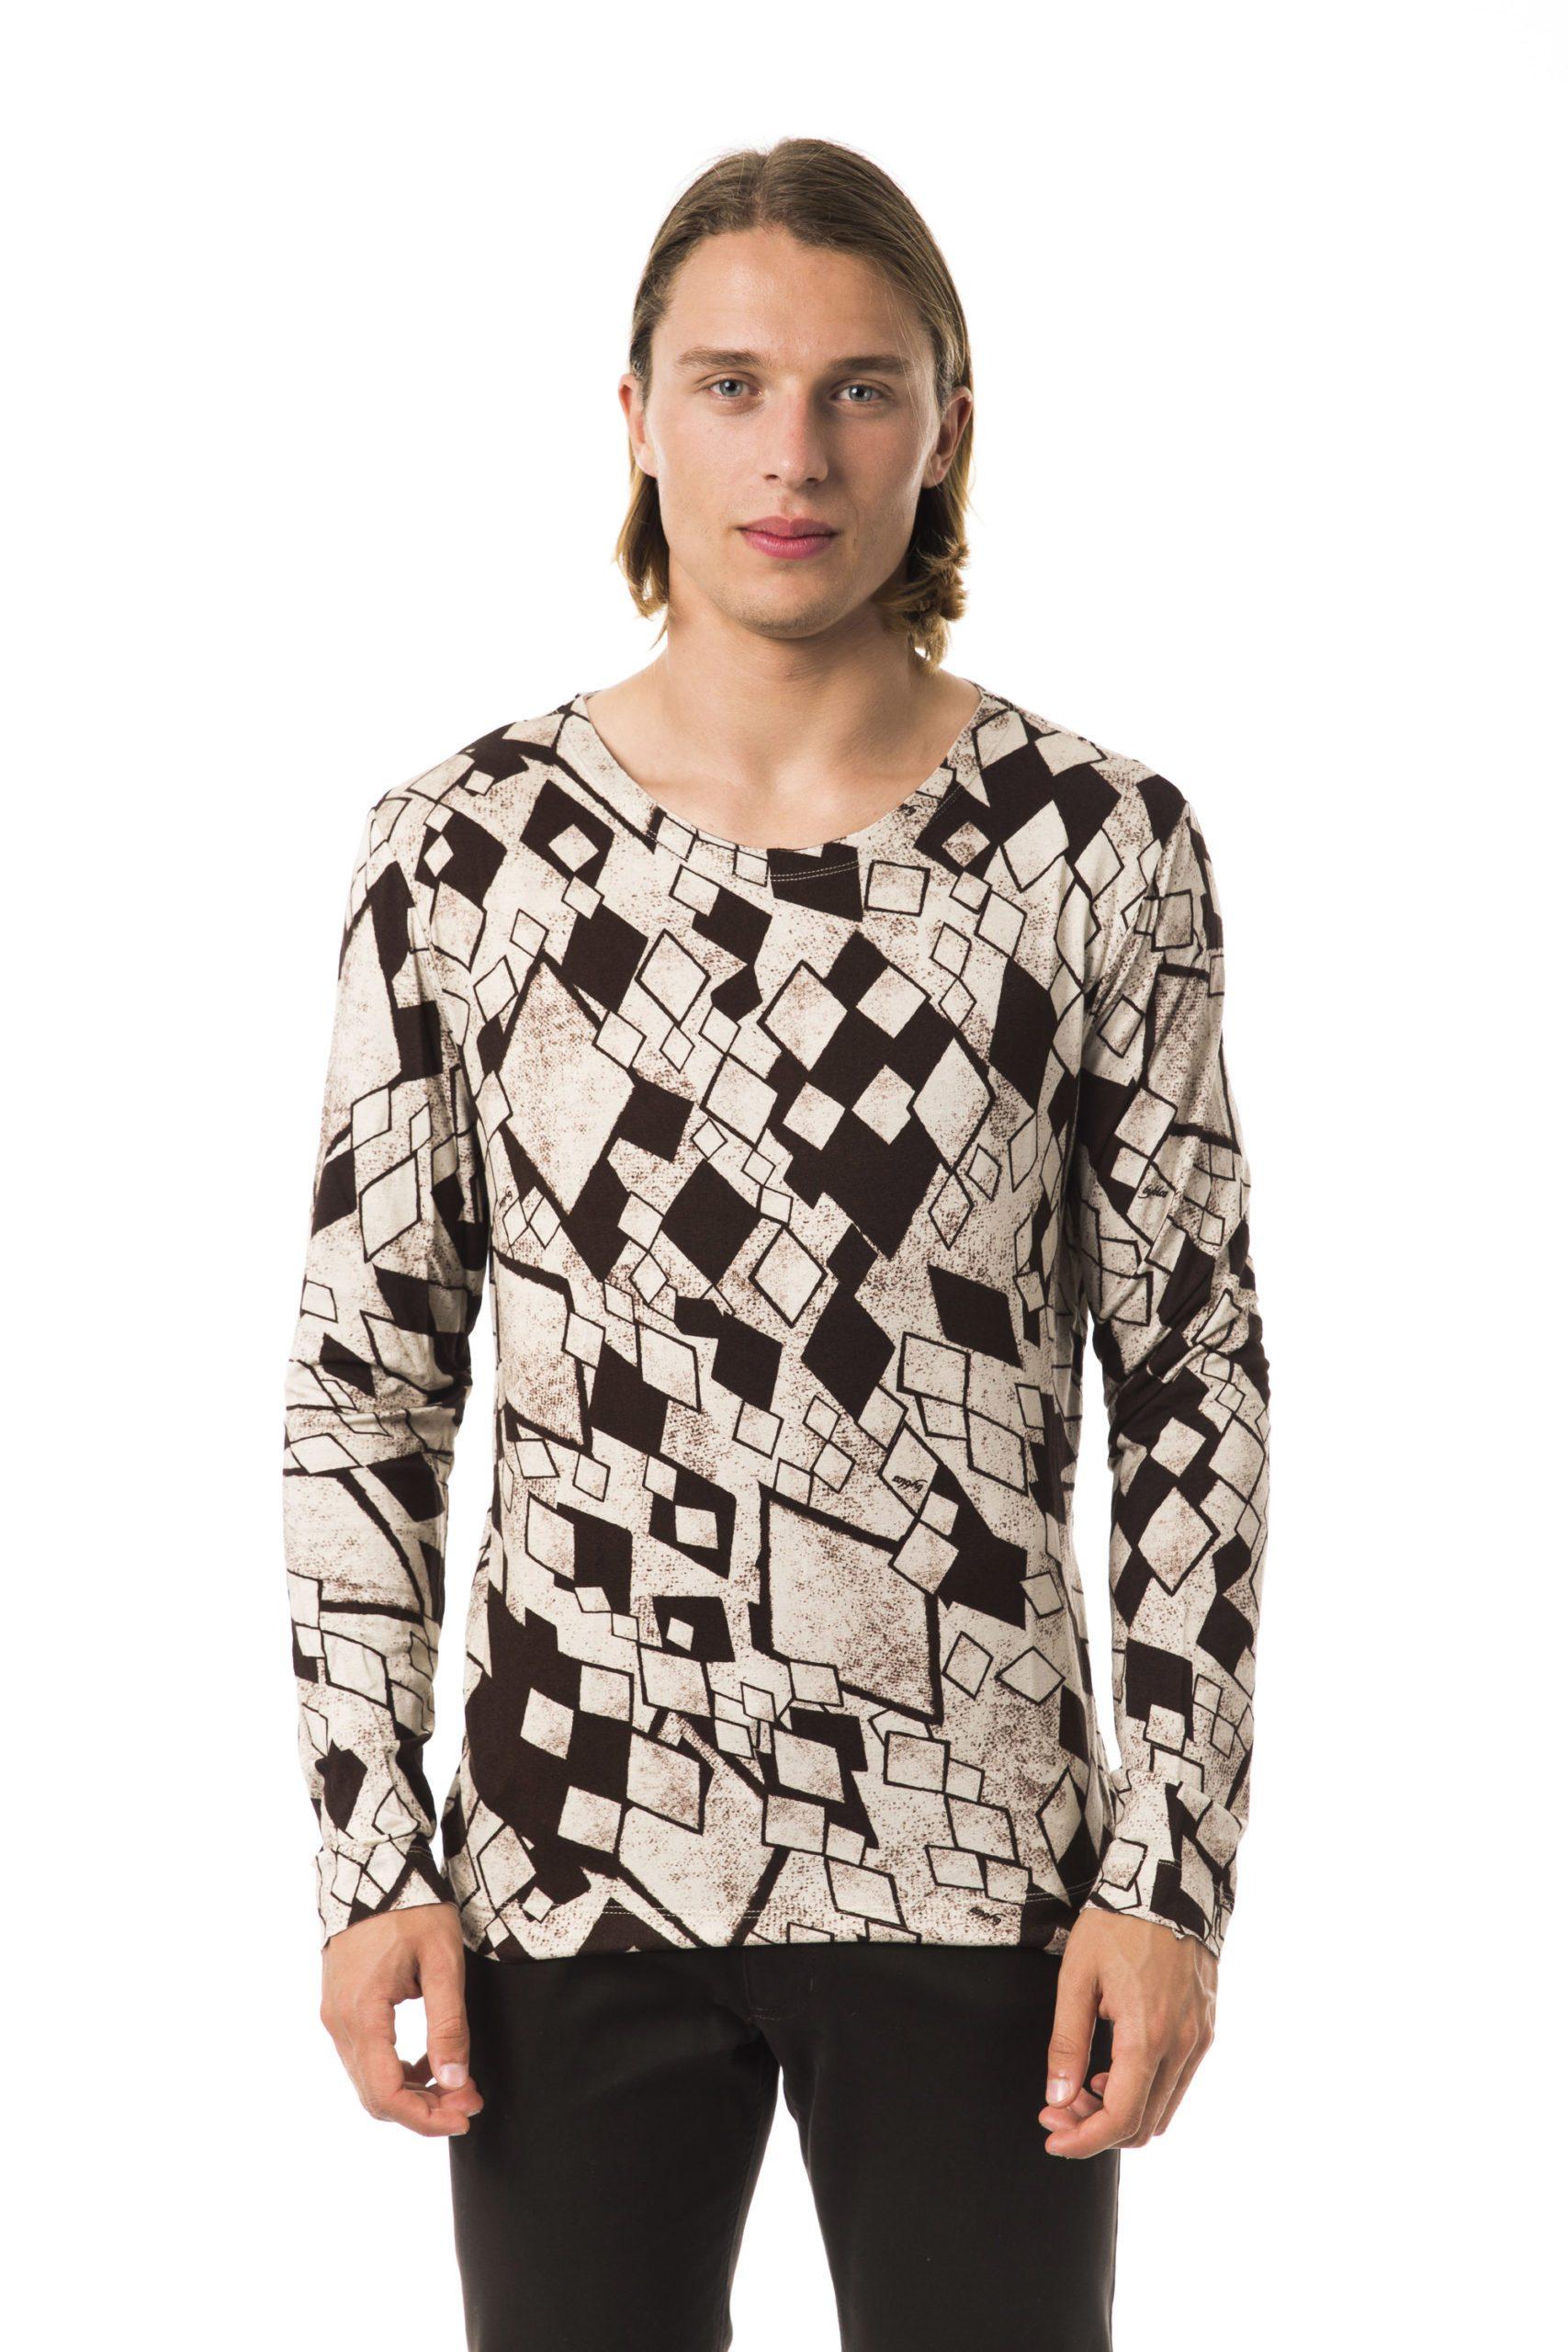 BYBLOS Men's Cartone T-Shirt Beige BY679450 - S